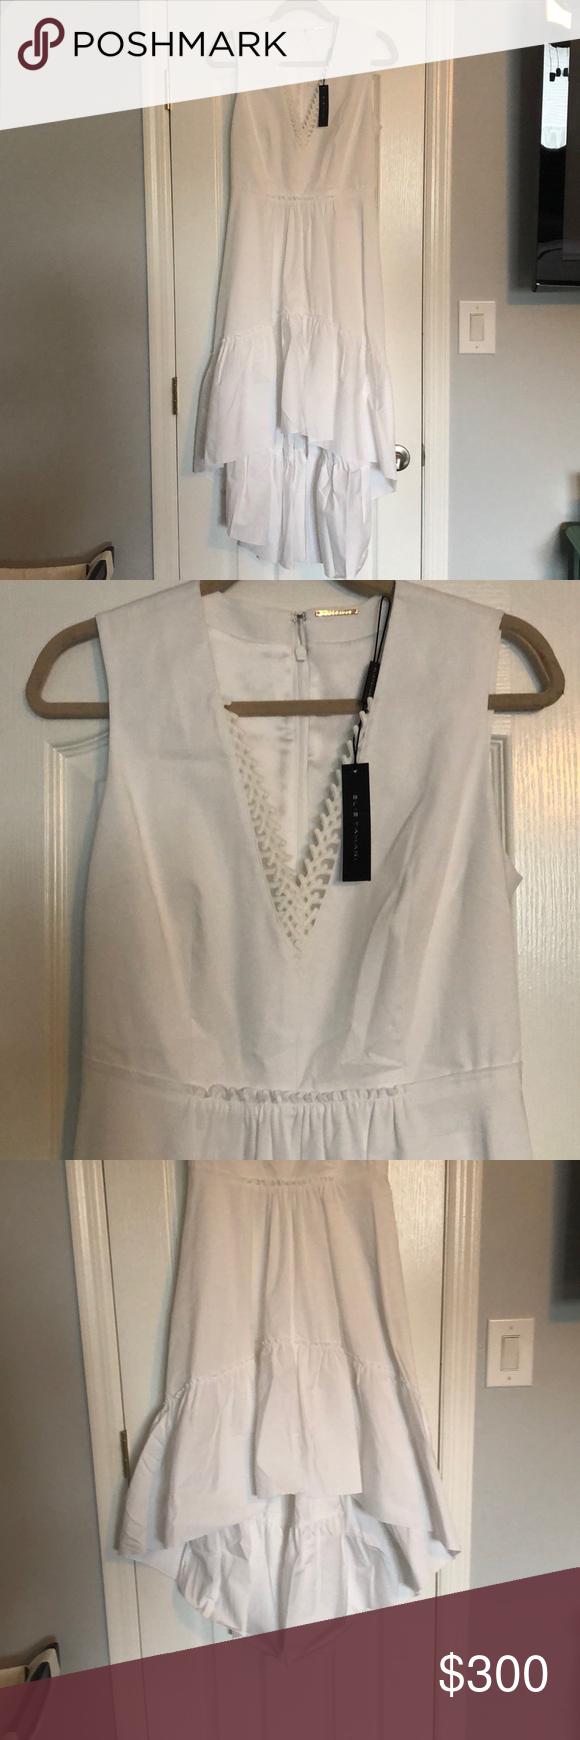 Brand New Elie Tahari White Dress Dress Brands Elie Tahari Dresses White Dress [ 1740 x 580 Pixel ]